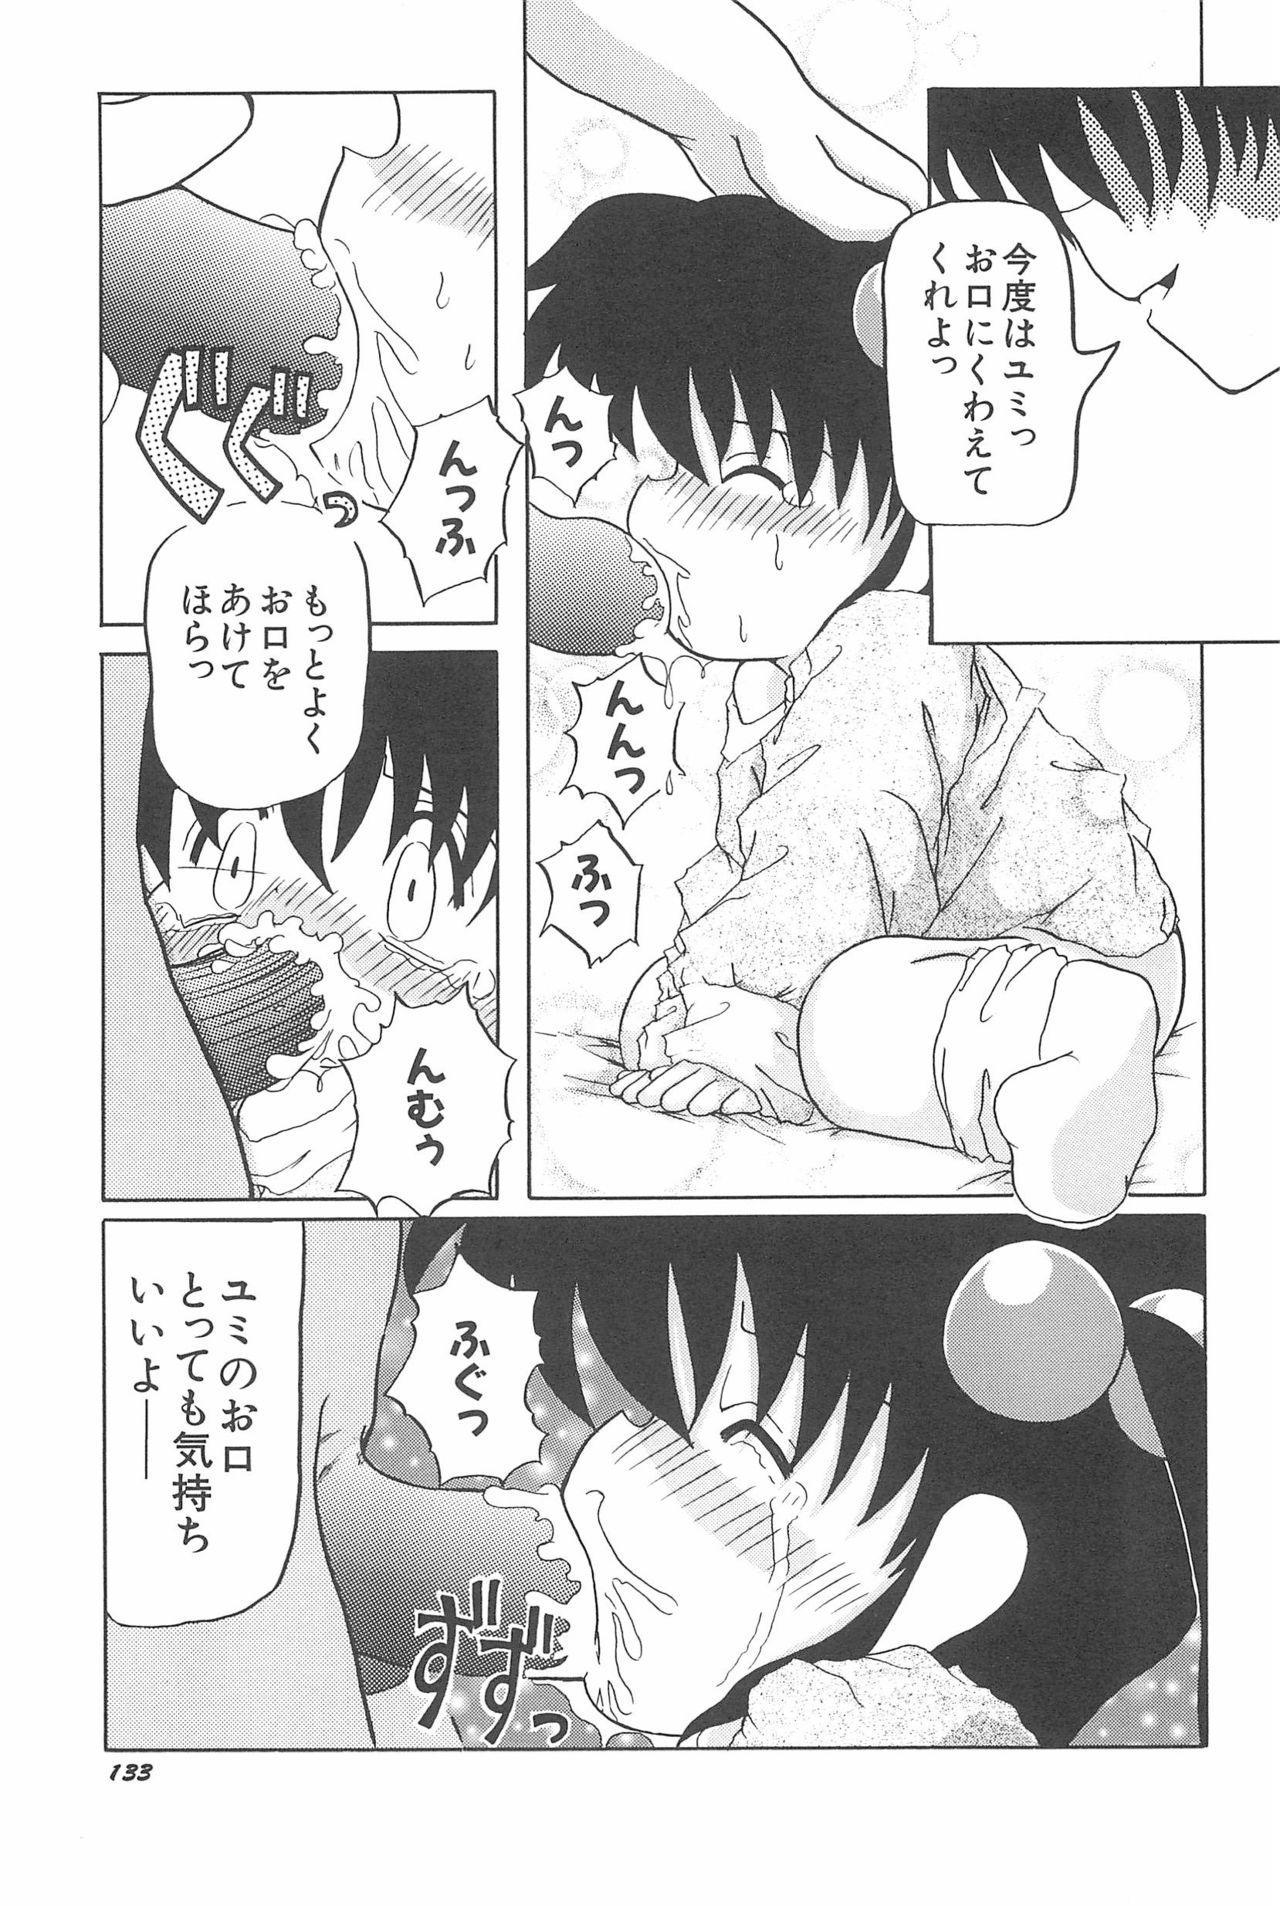 Aoi Shojokyuu 138